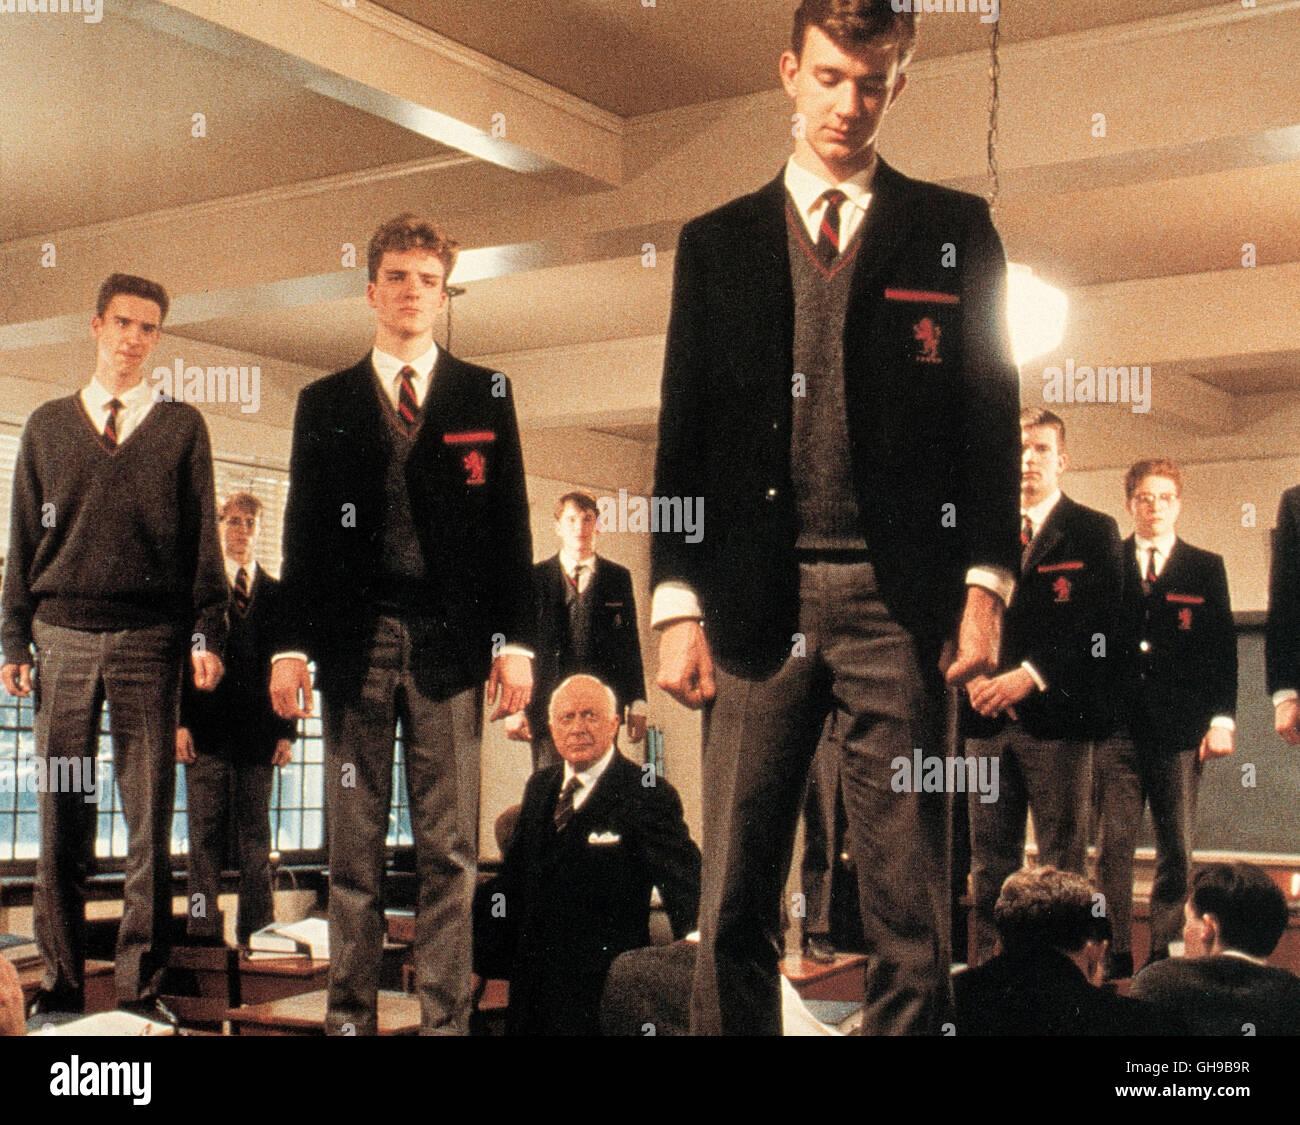 DER CLUB DER TOTEN DICHTER / poeta morto la società USA 1988 / Peter Weir Szene mit JAMES WATERSTON, ALLELON Immagini Stock